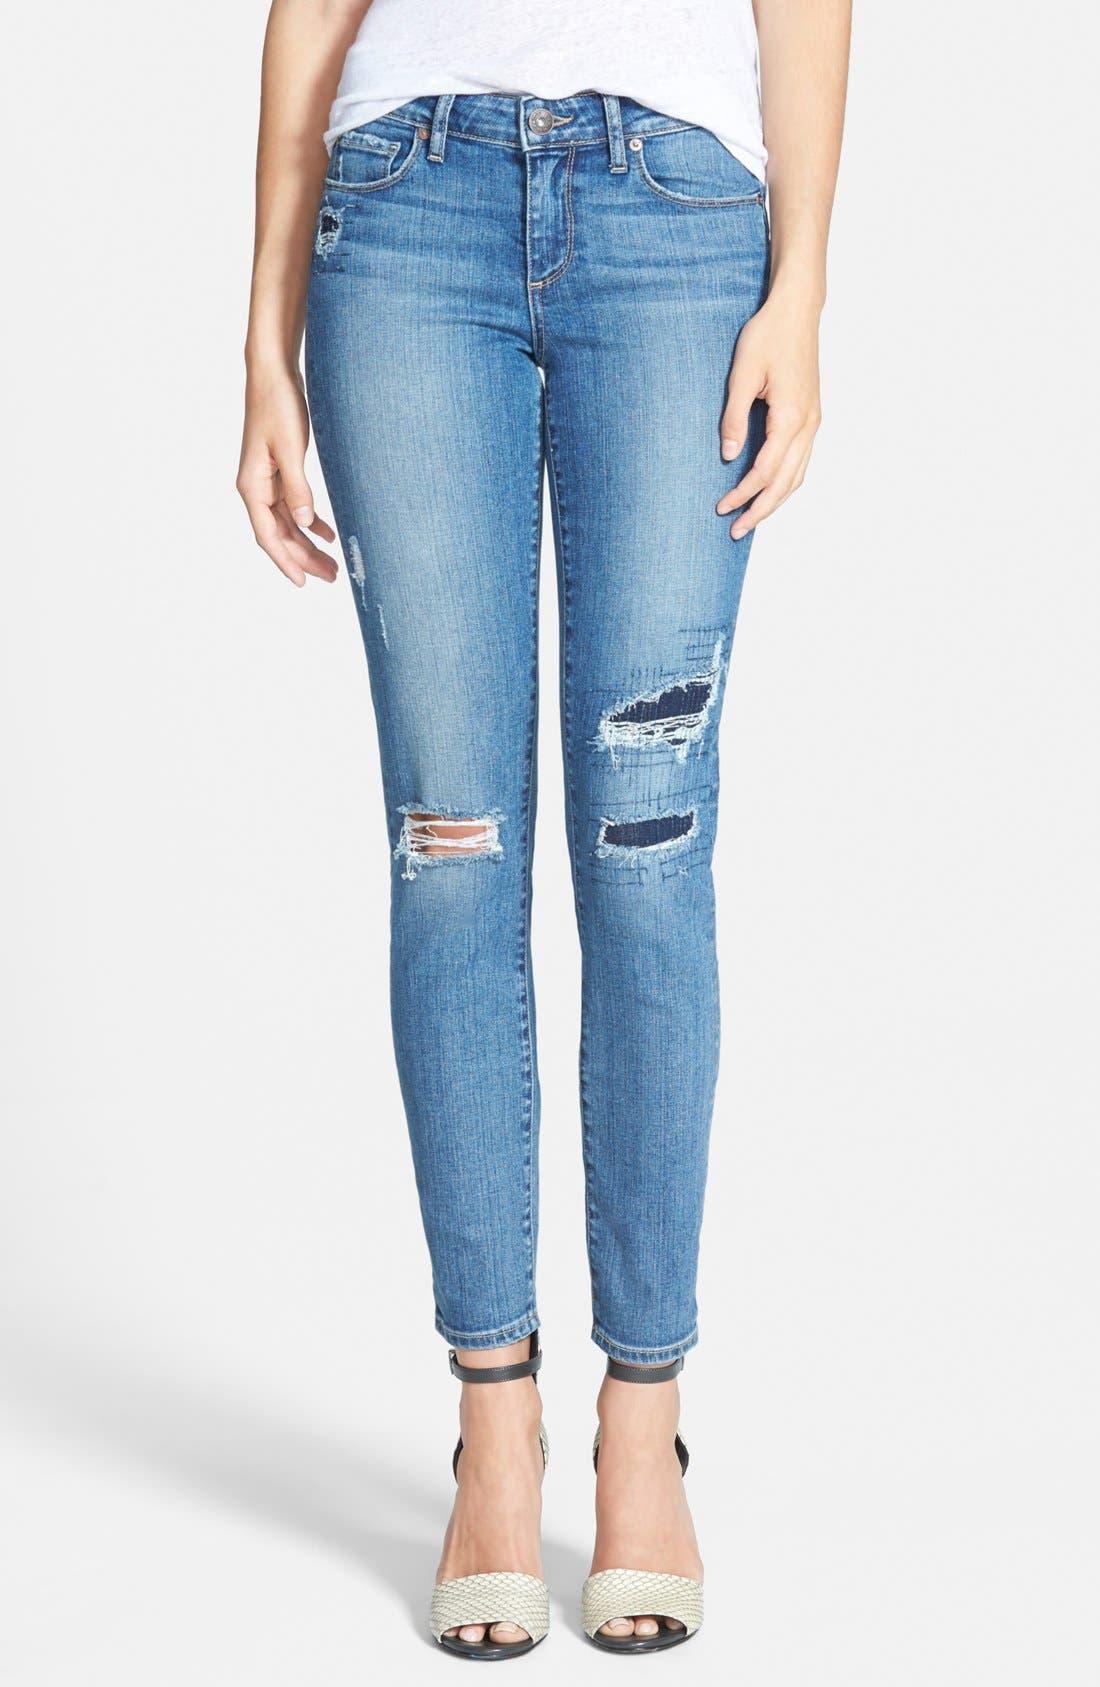 Main Image - Paige Denim 'Skyline' Ankle Peg Skinny Jeans (Esme Destructed)